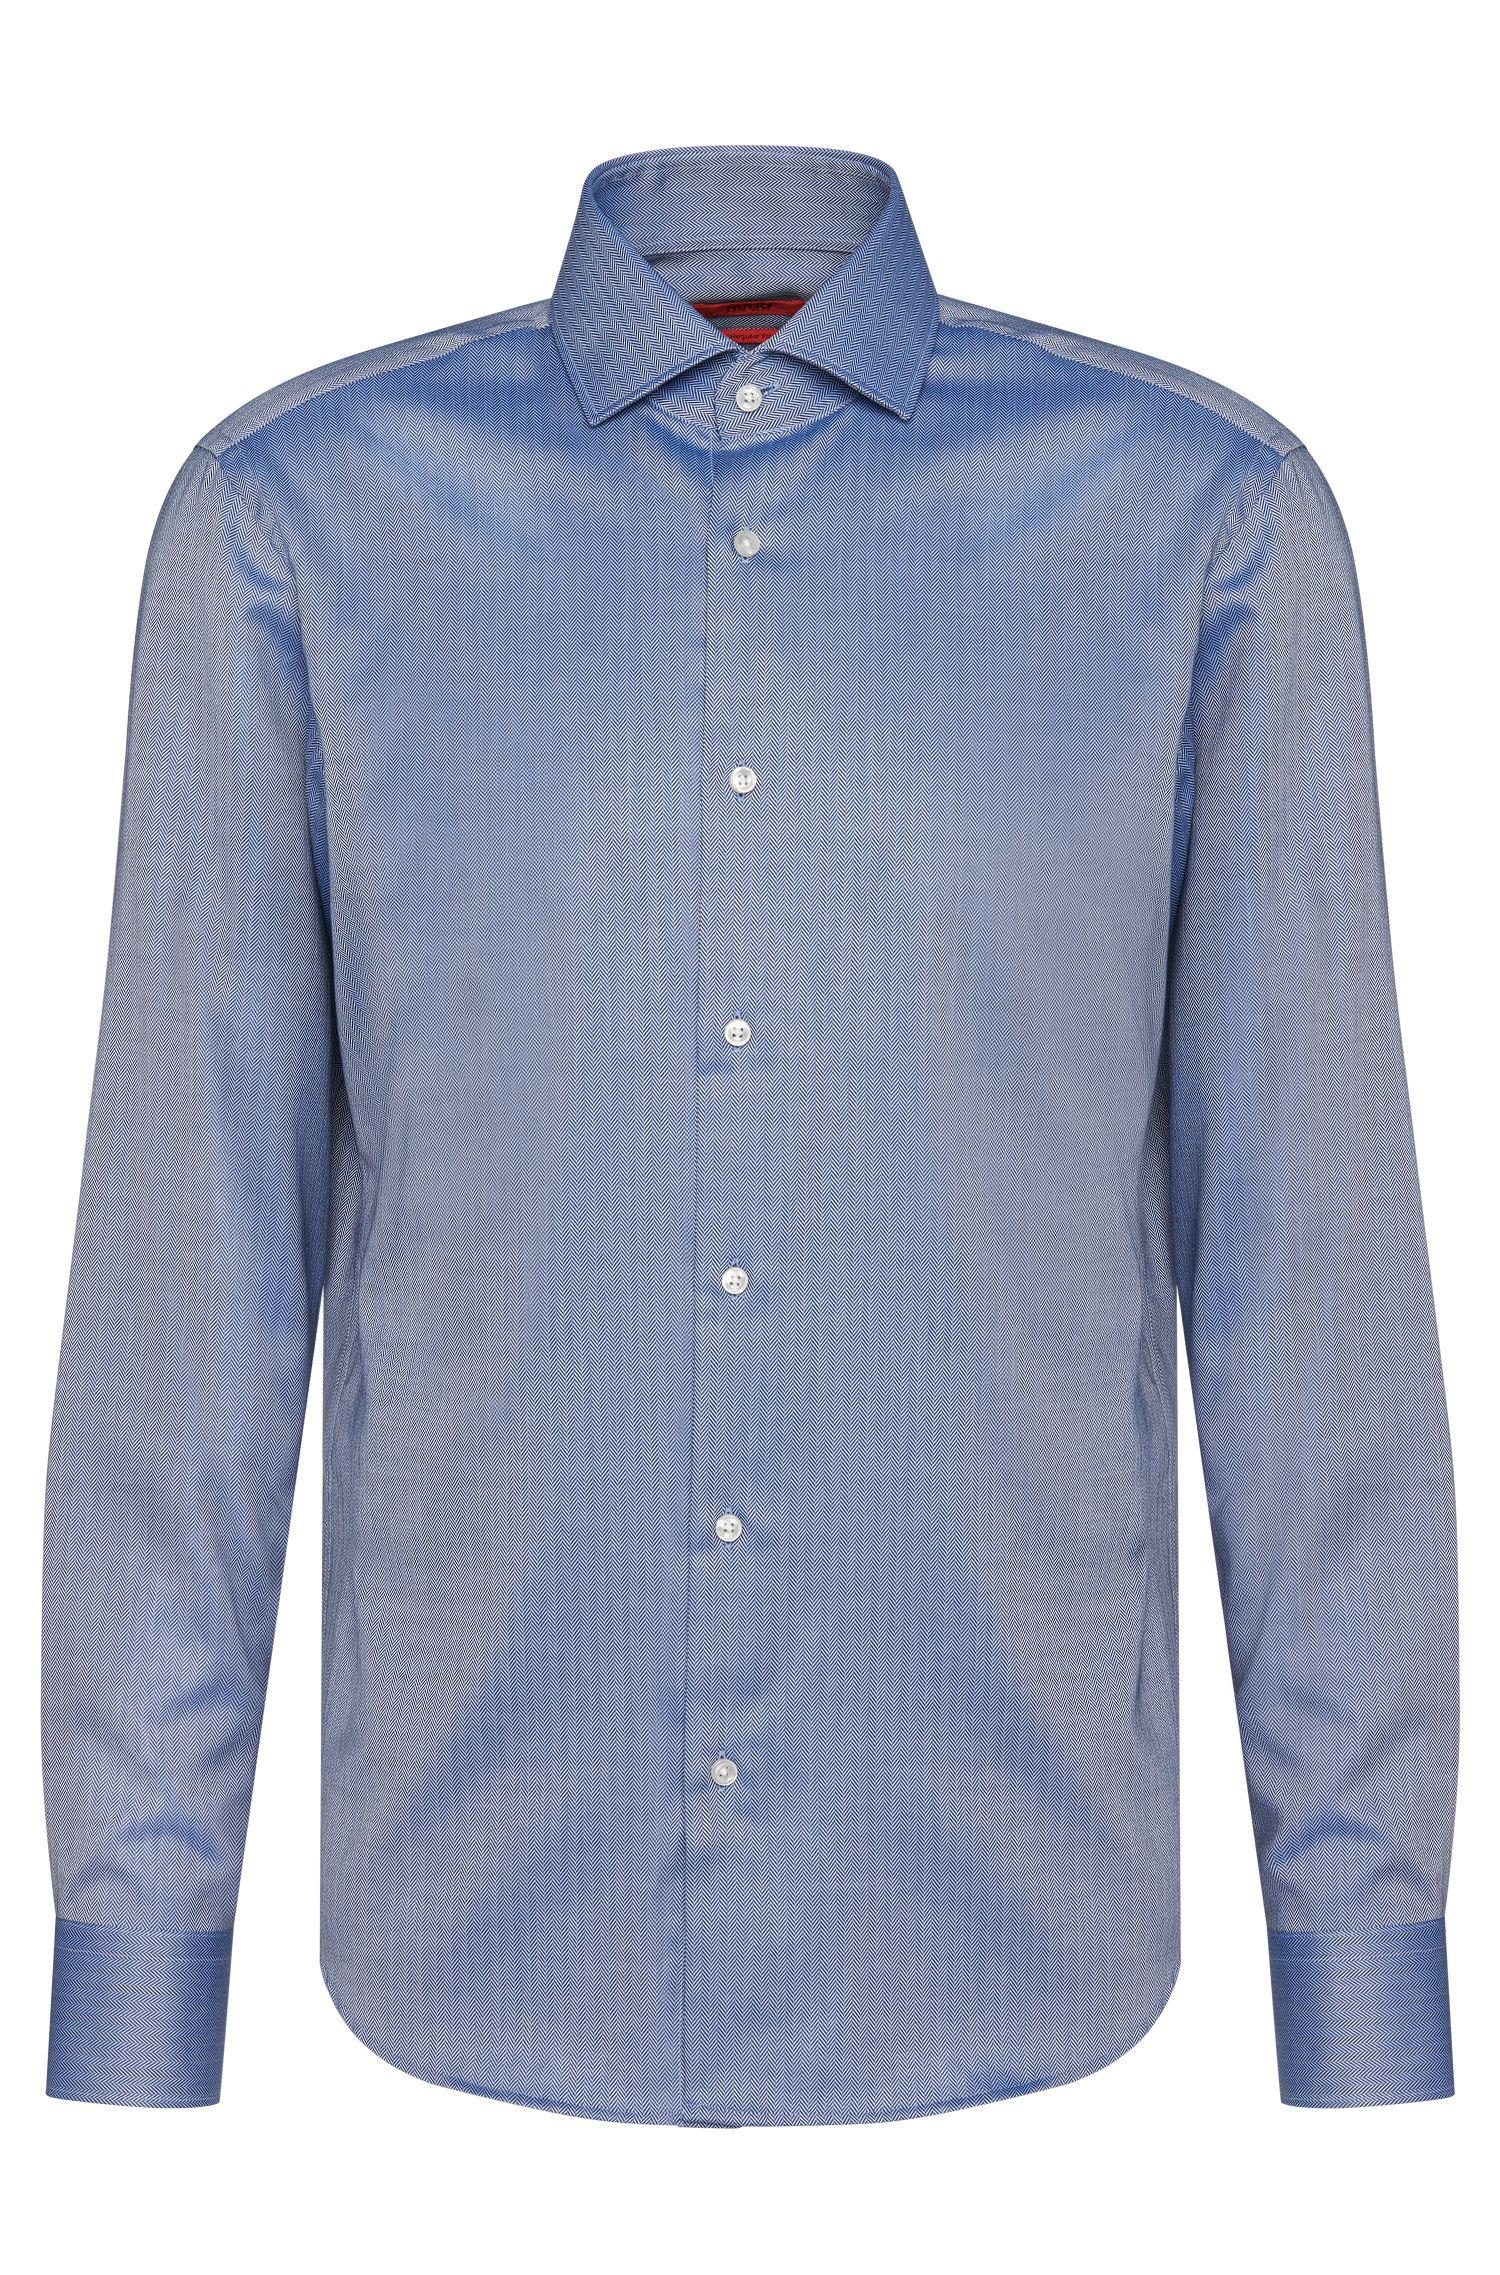 Regular-fit overhemd van katoen met visgraatpatroon: 'C-Gordon'